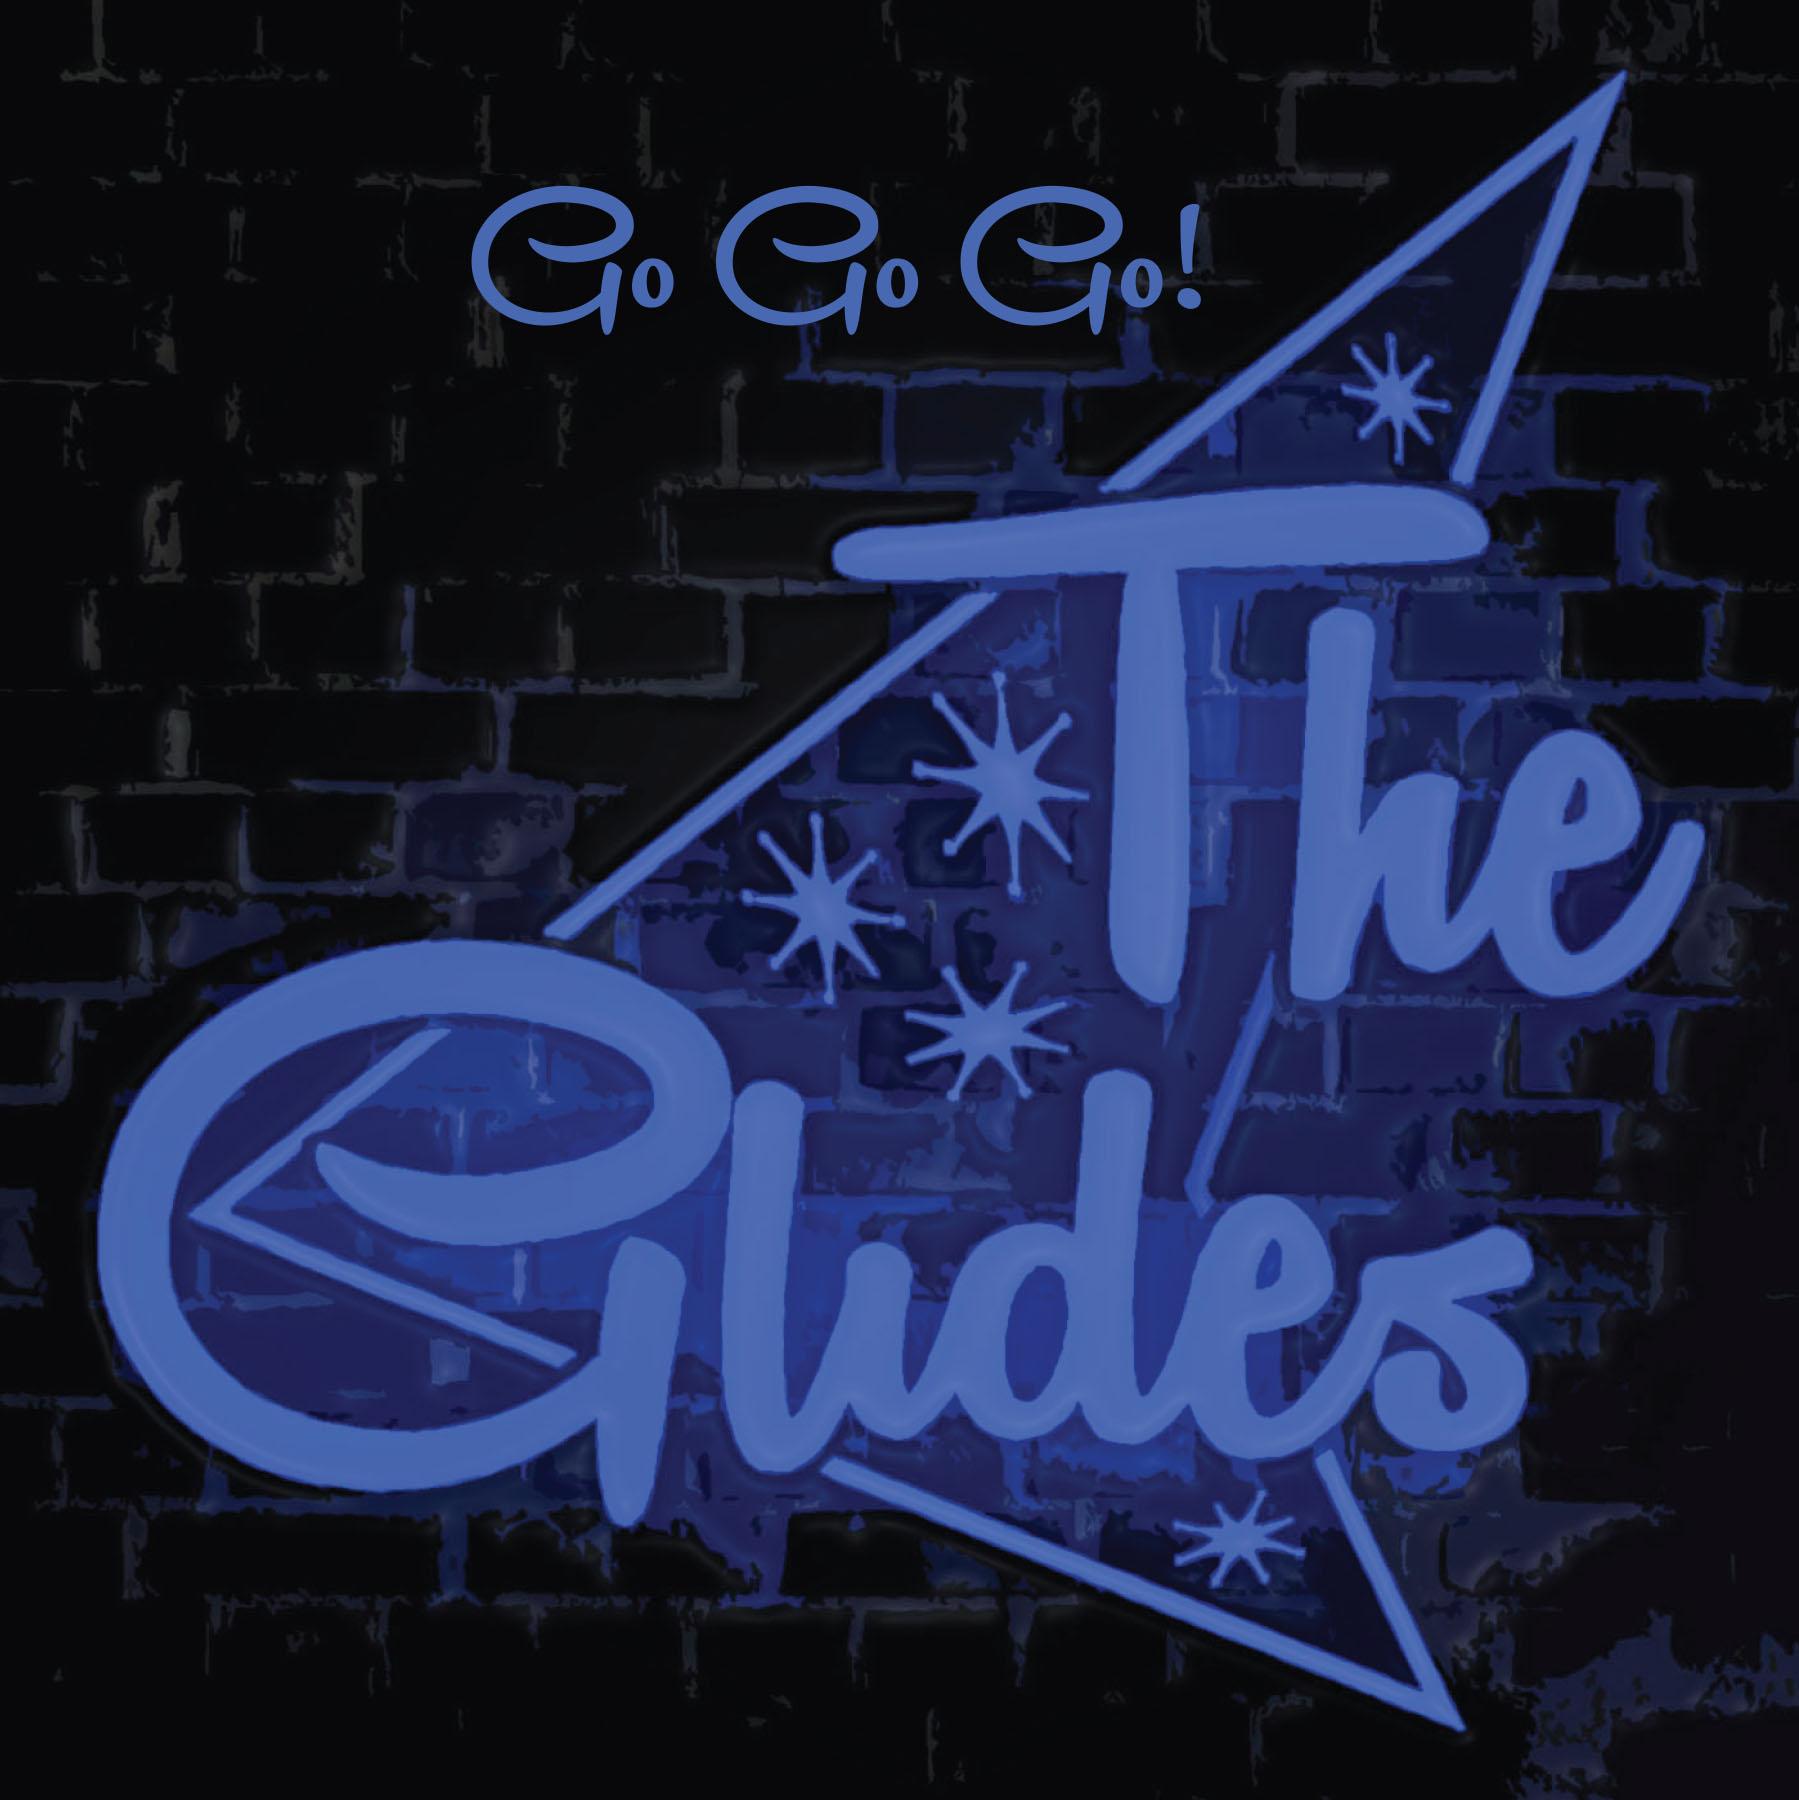 The Glides Go Go Go Logo